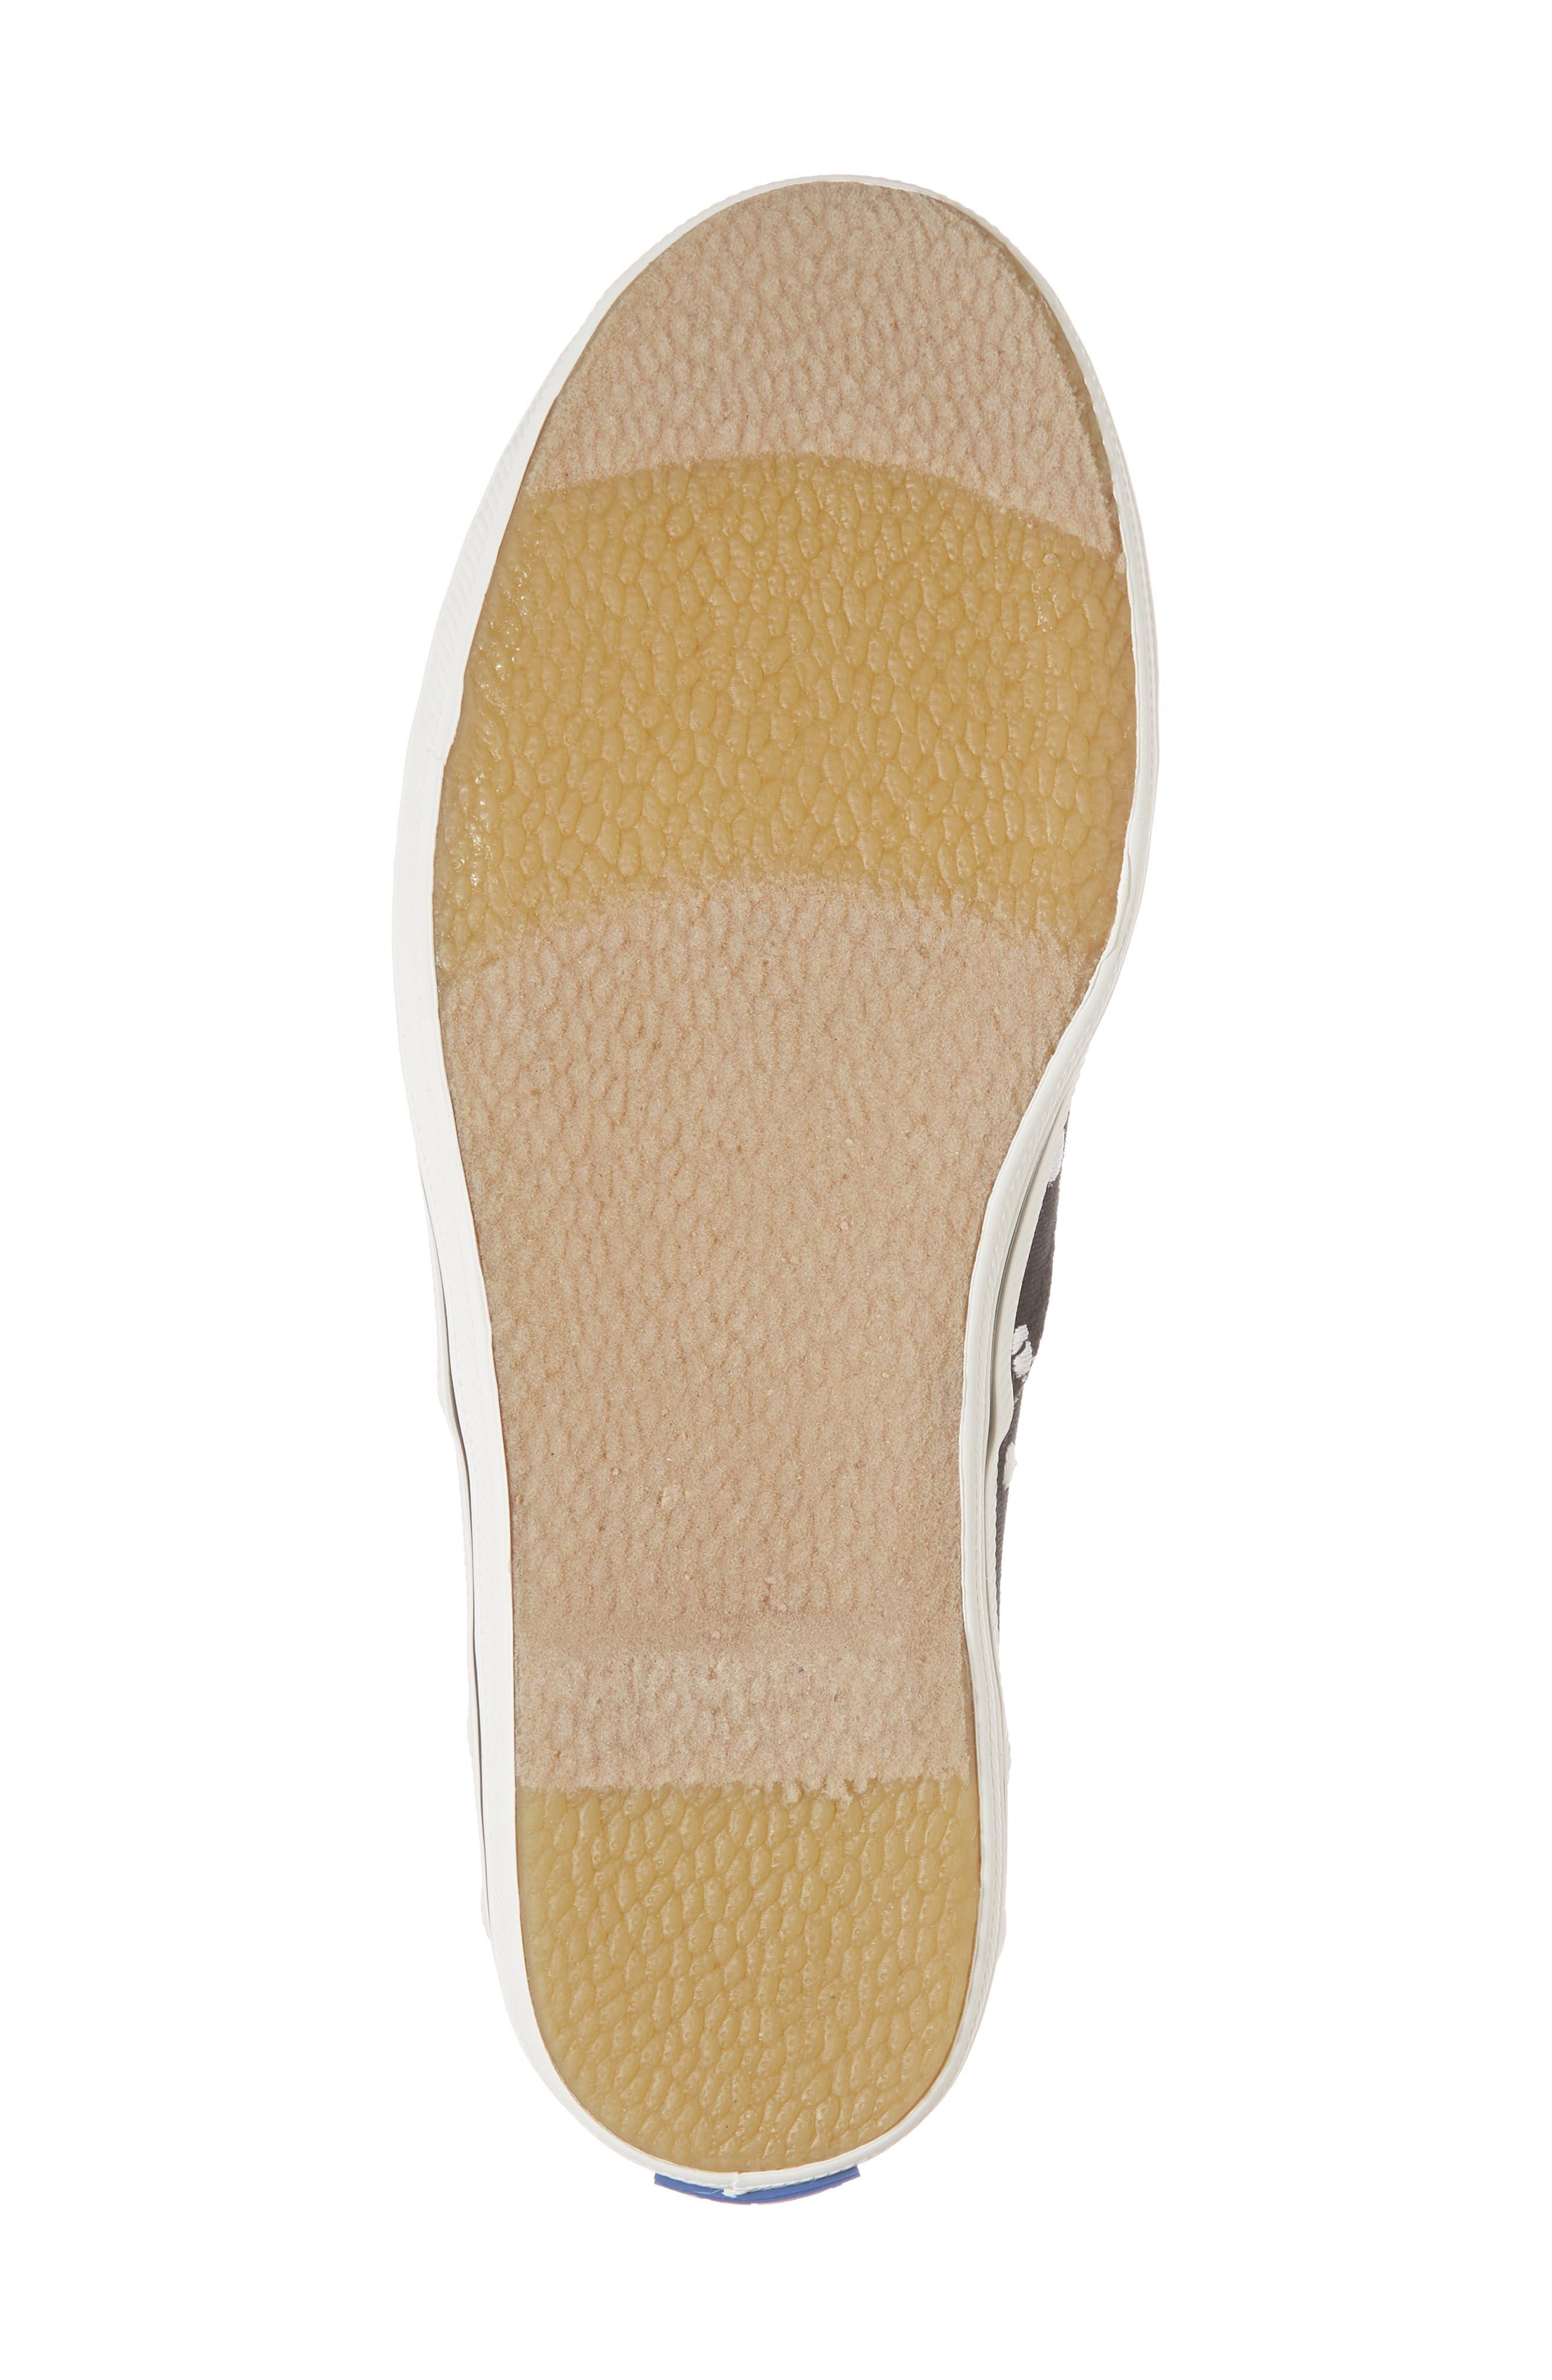 x kate spade new york champion polka dot lace-up shoe,                             Alternate thumbnail 6, color,                             BLACK DANCING DOT